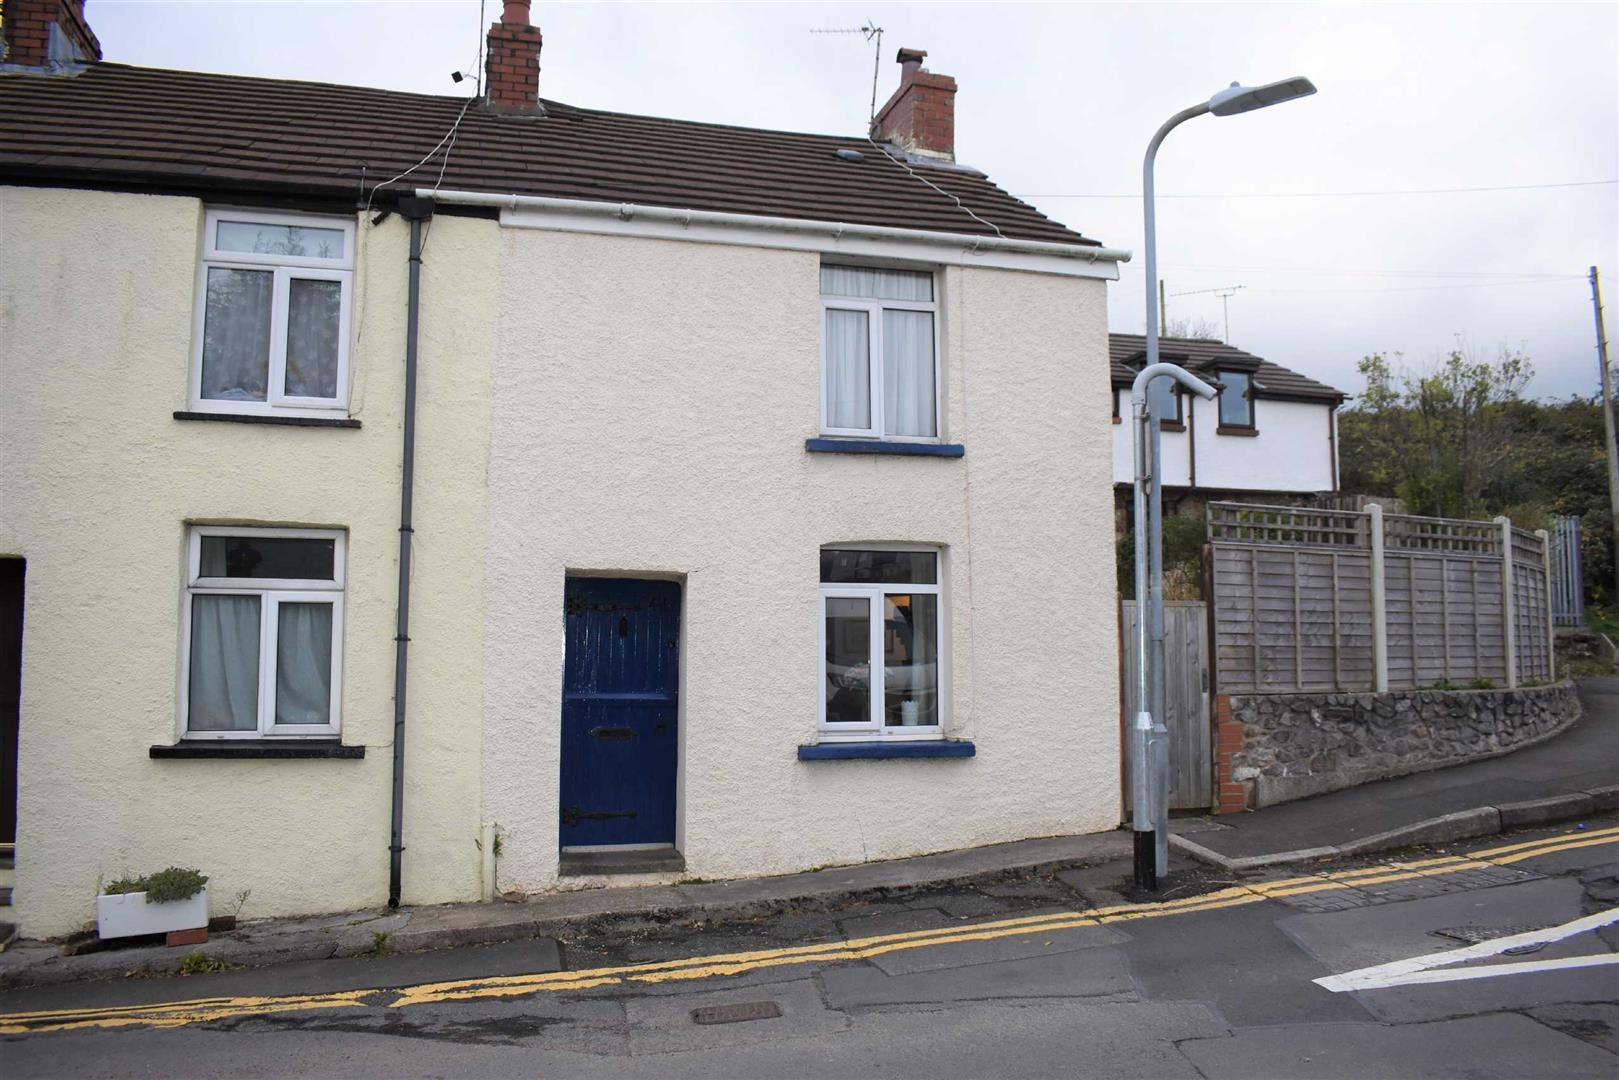 Thistleboon Road, Mumbles, Swansea, SA3 4HE